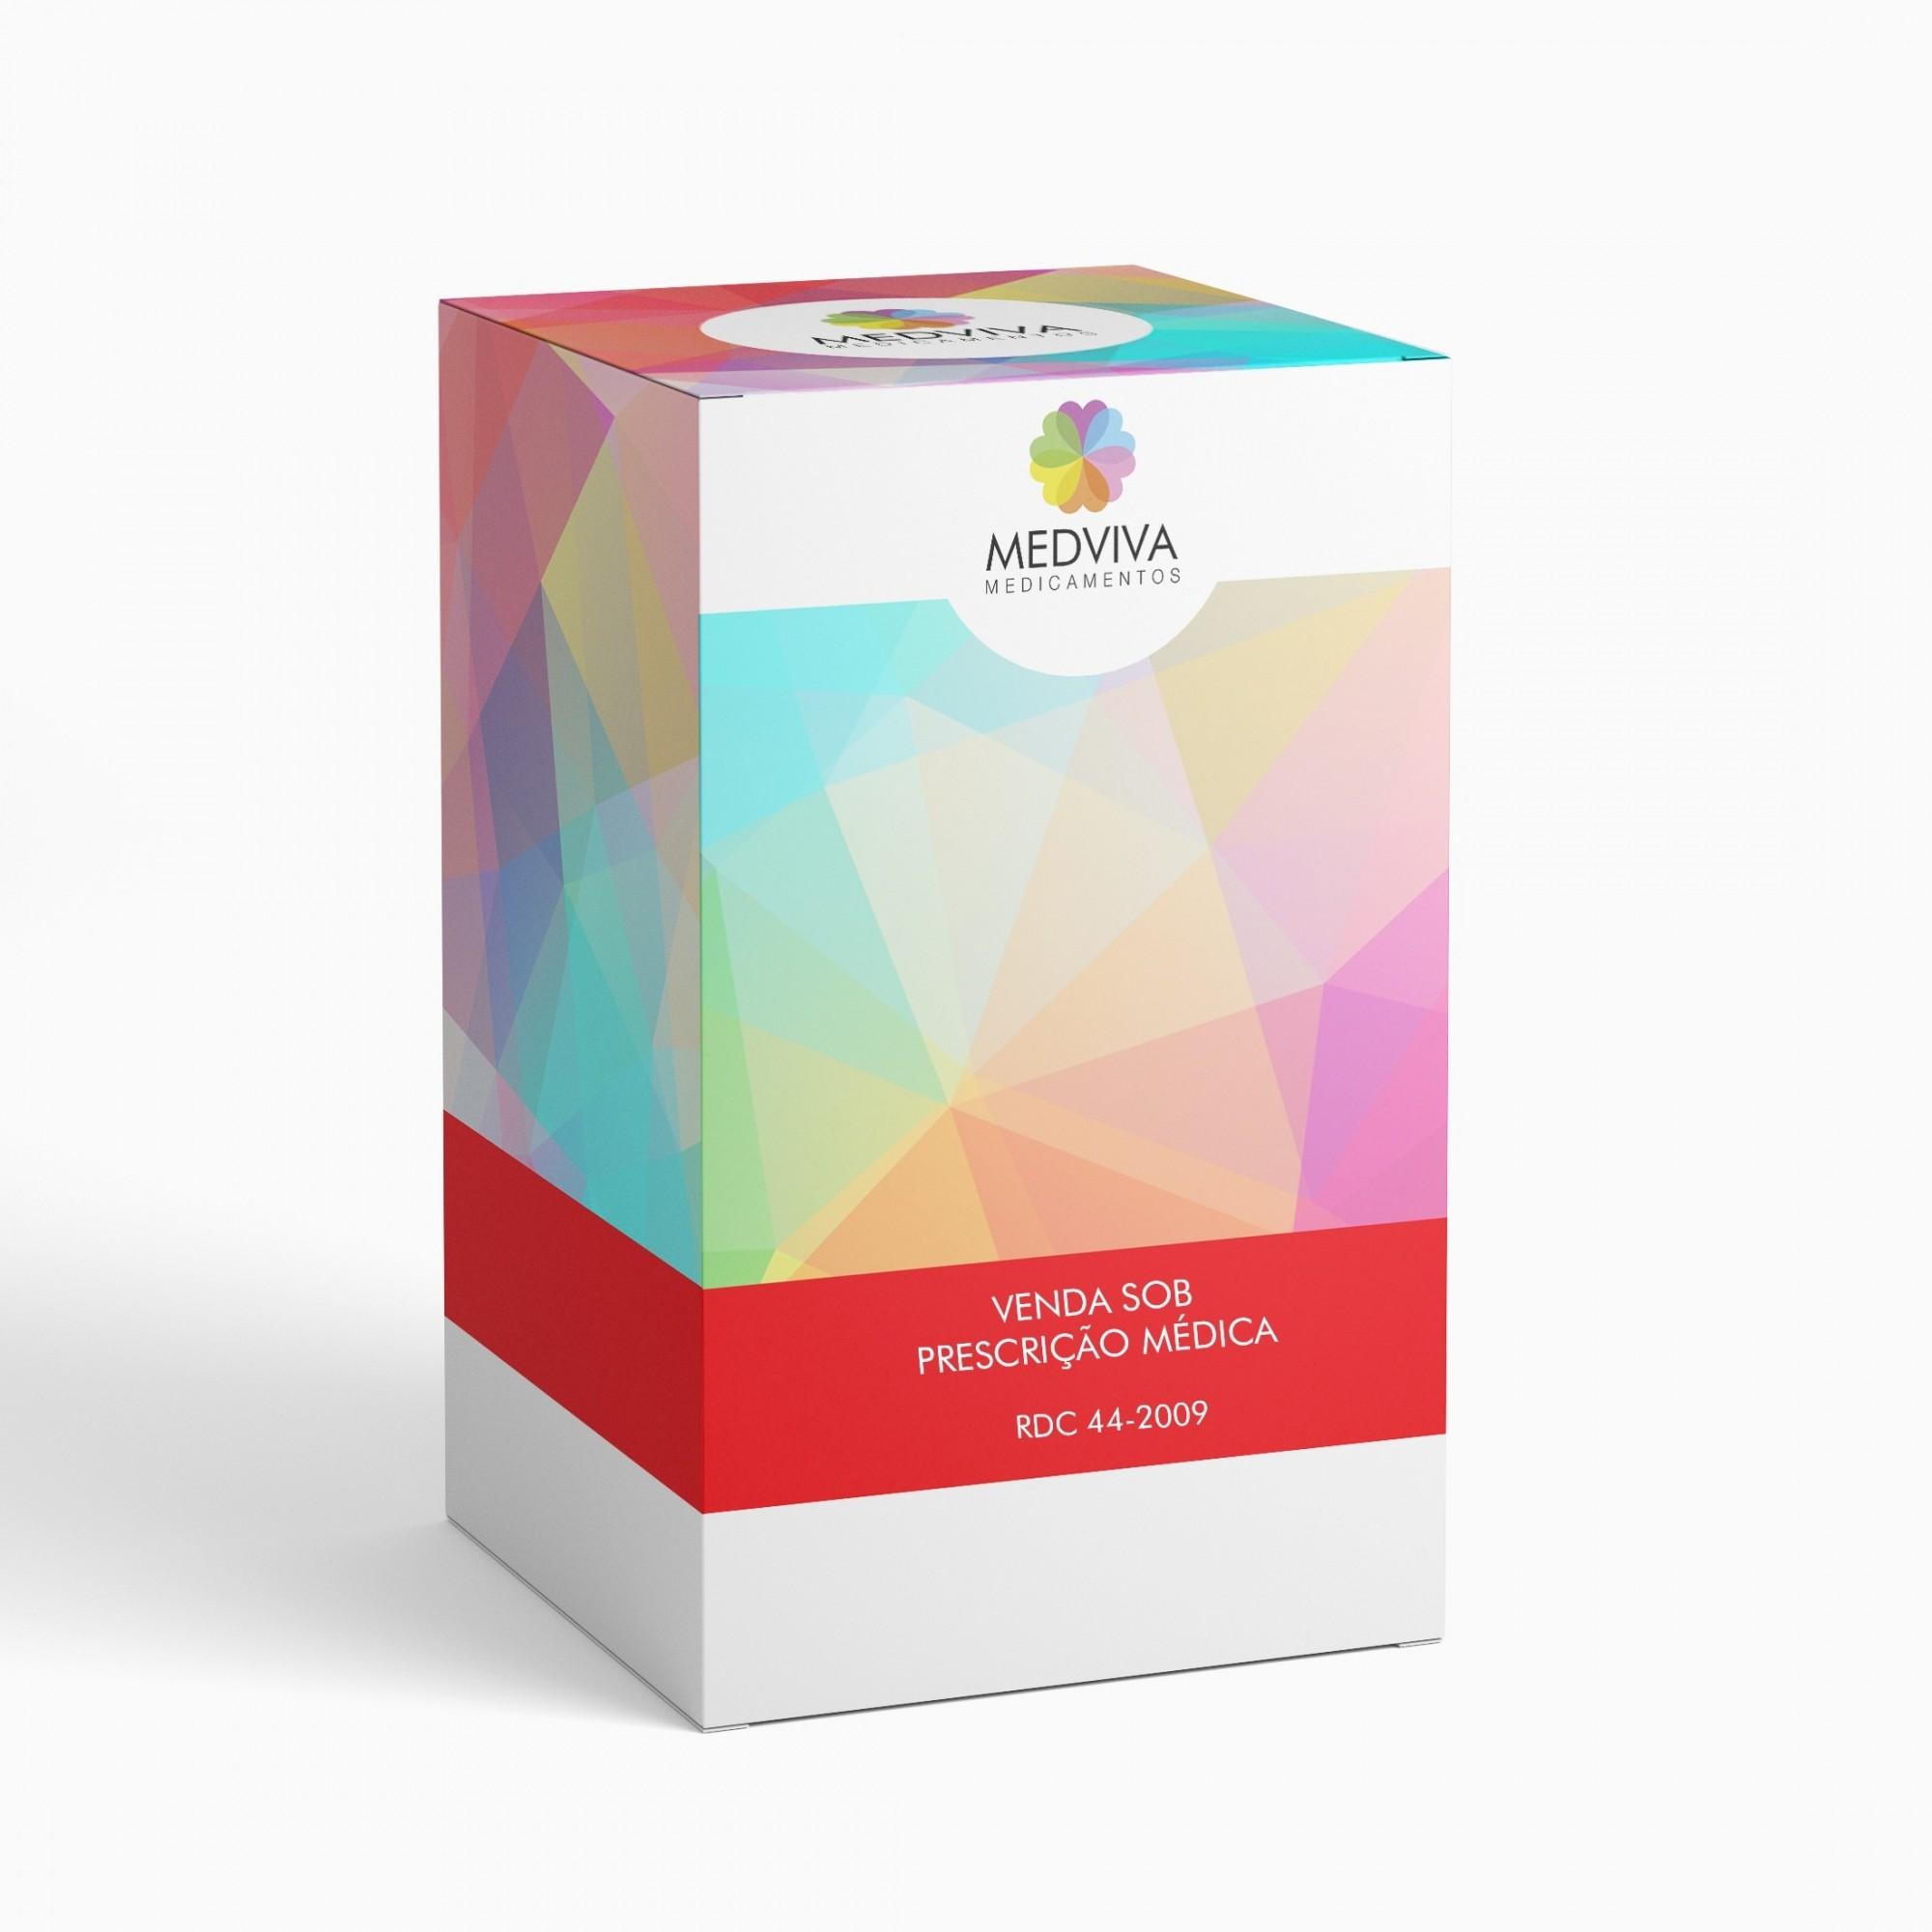 Myfortic 360mg - Novarts (com 120  Comprimidos Revestidos)